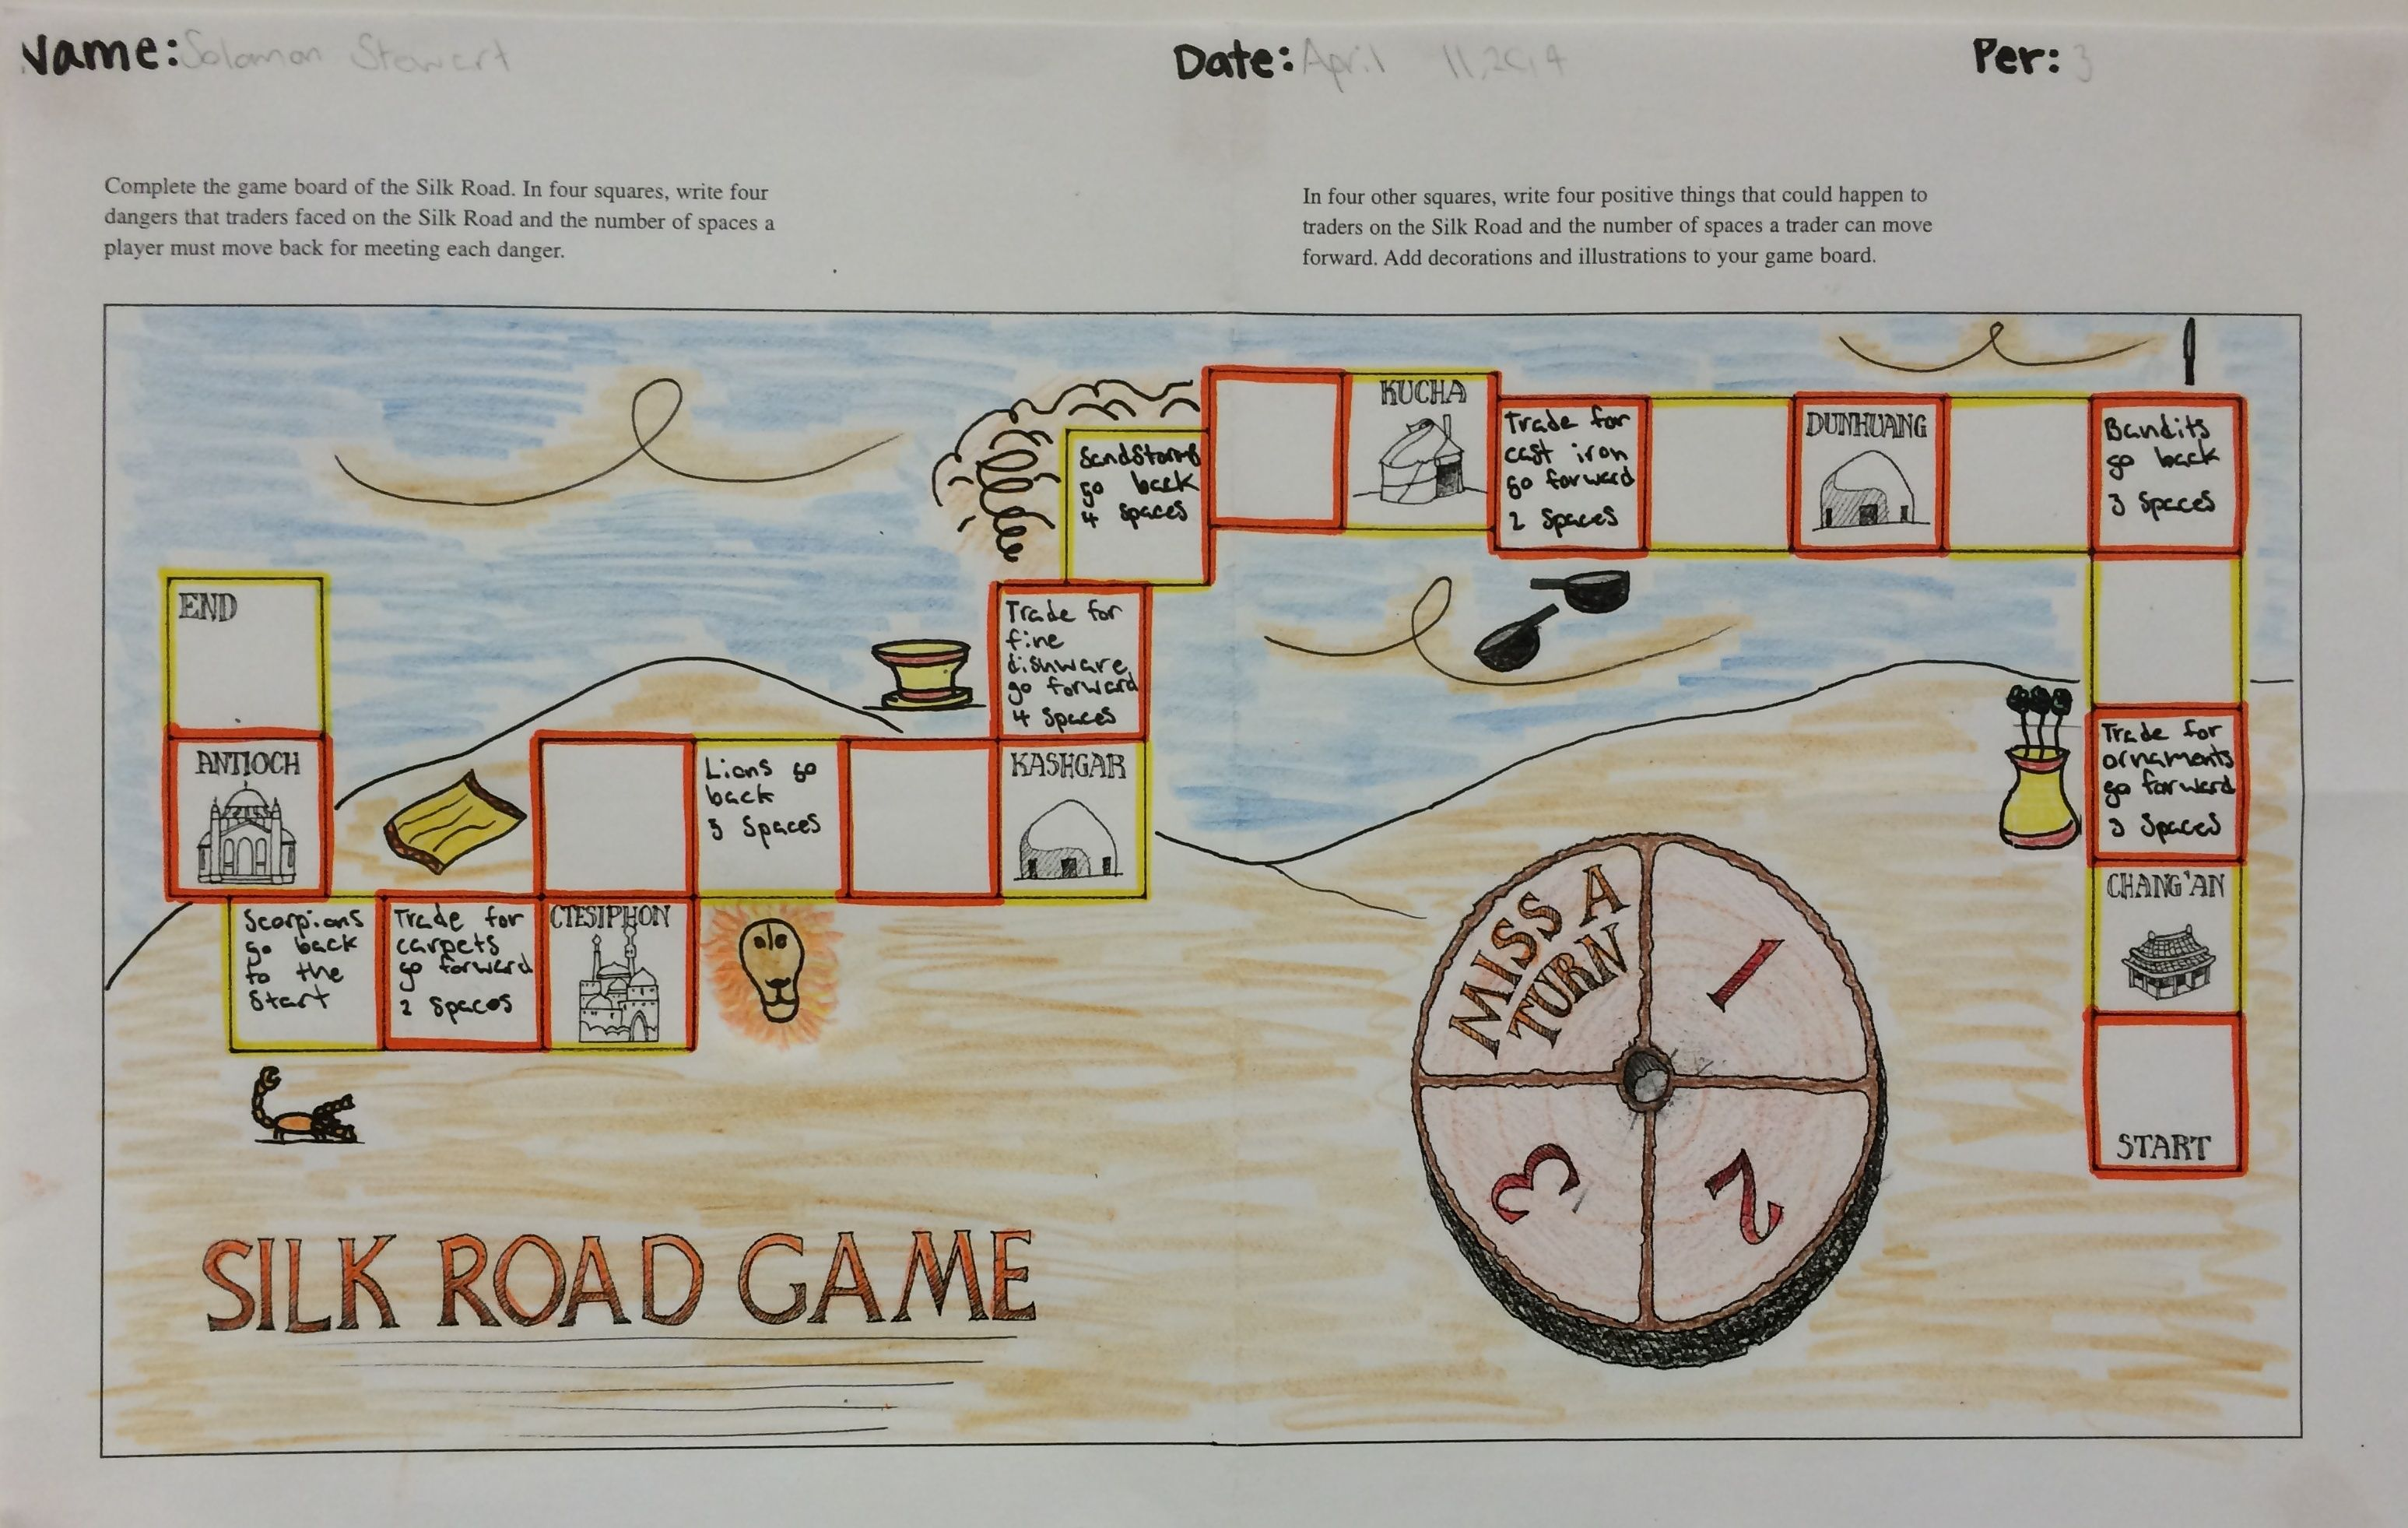 Silk Road Game 3 094 1 963 Pixels